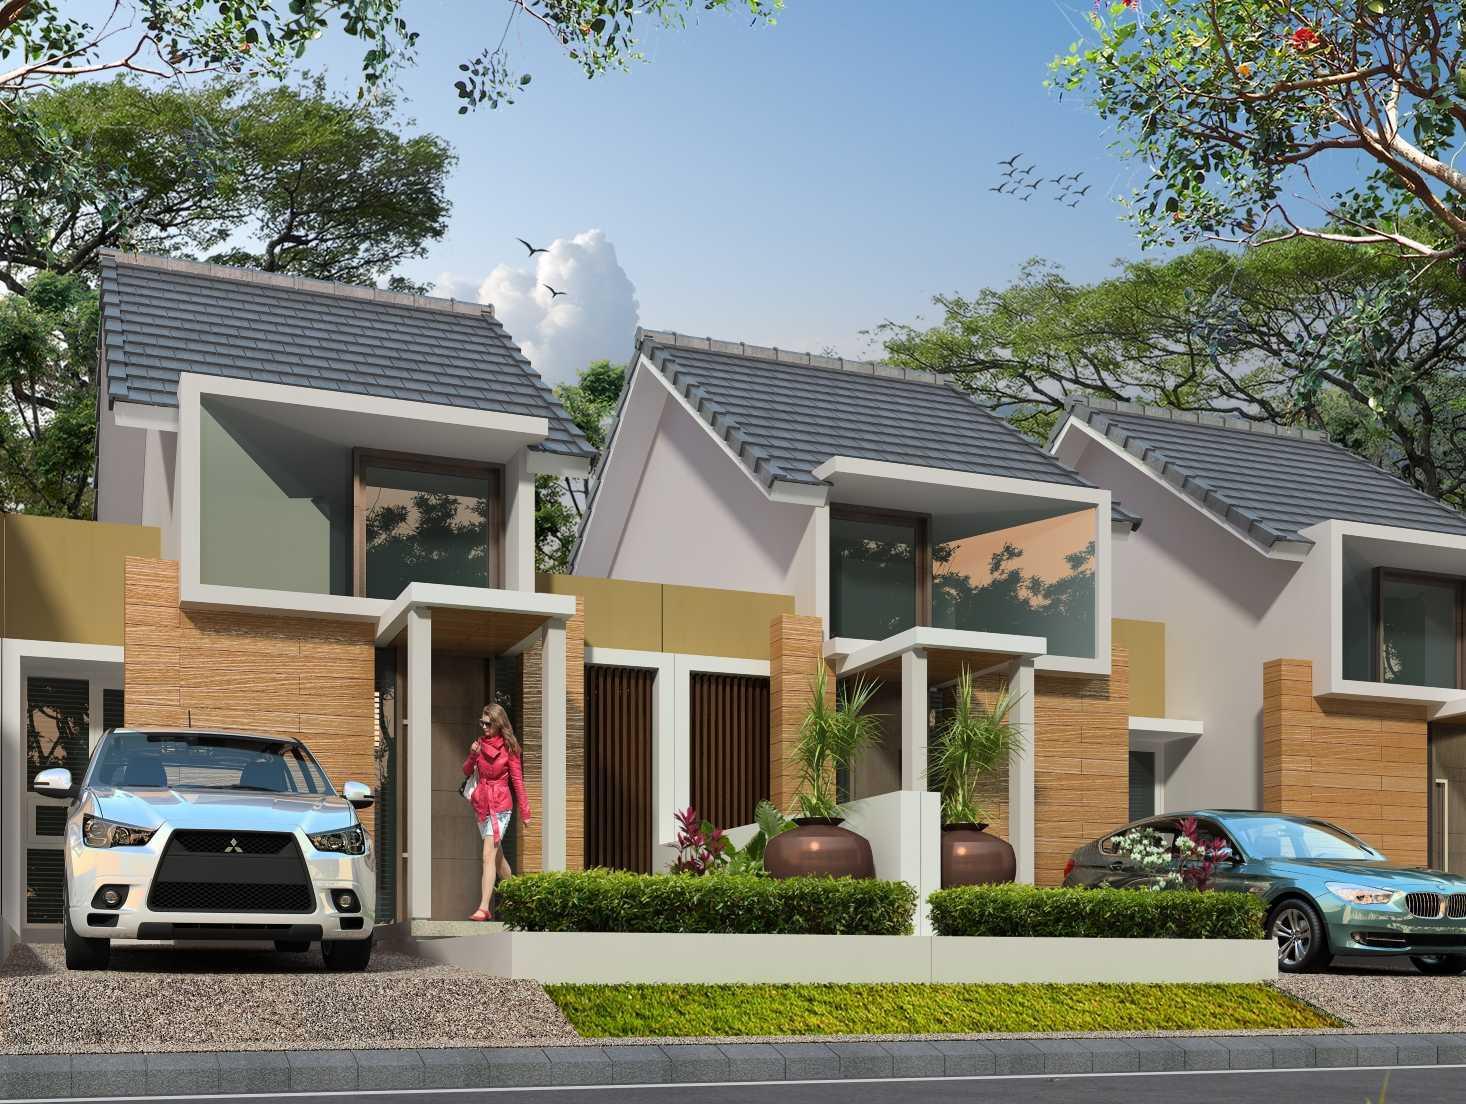 Satuvista Architect Taman Beverly Residence  Samarinda, Kota Samarinda, Kalimantan Timur, Indonesia Samarinda, Kota Samarinda, Kalimantan Timur, Indonesia Facade View Minimalist  50515